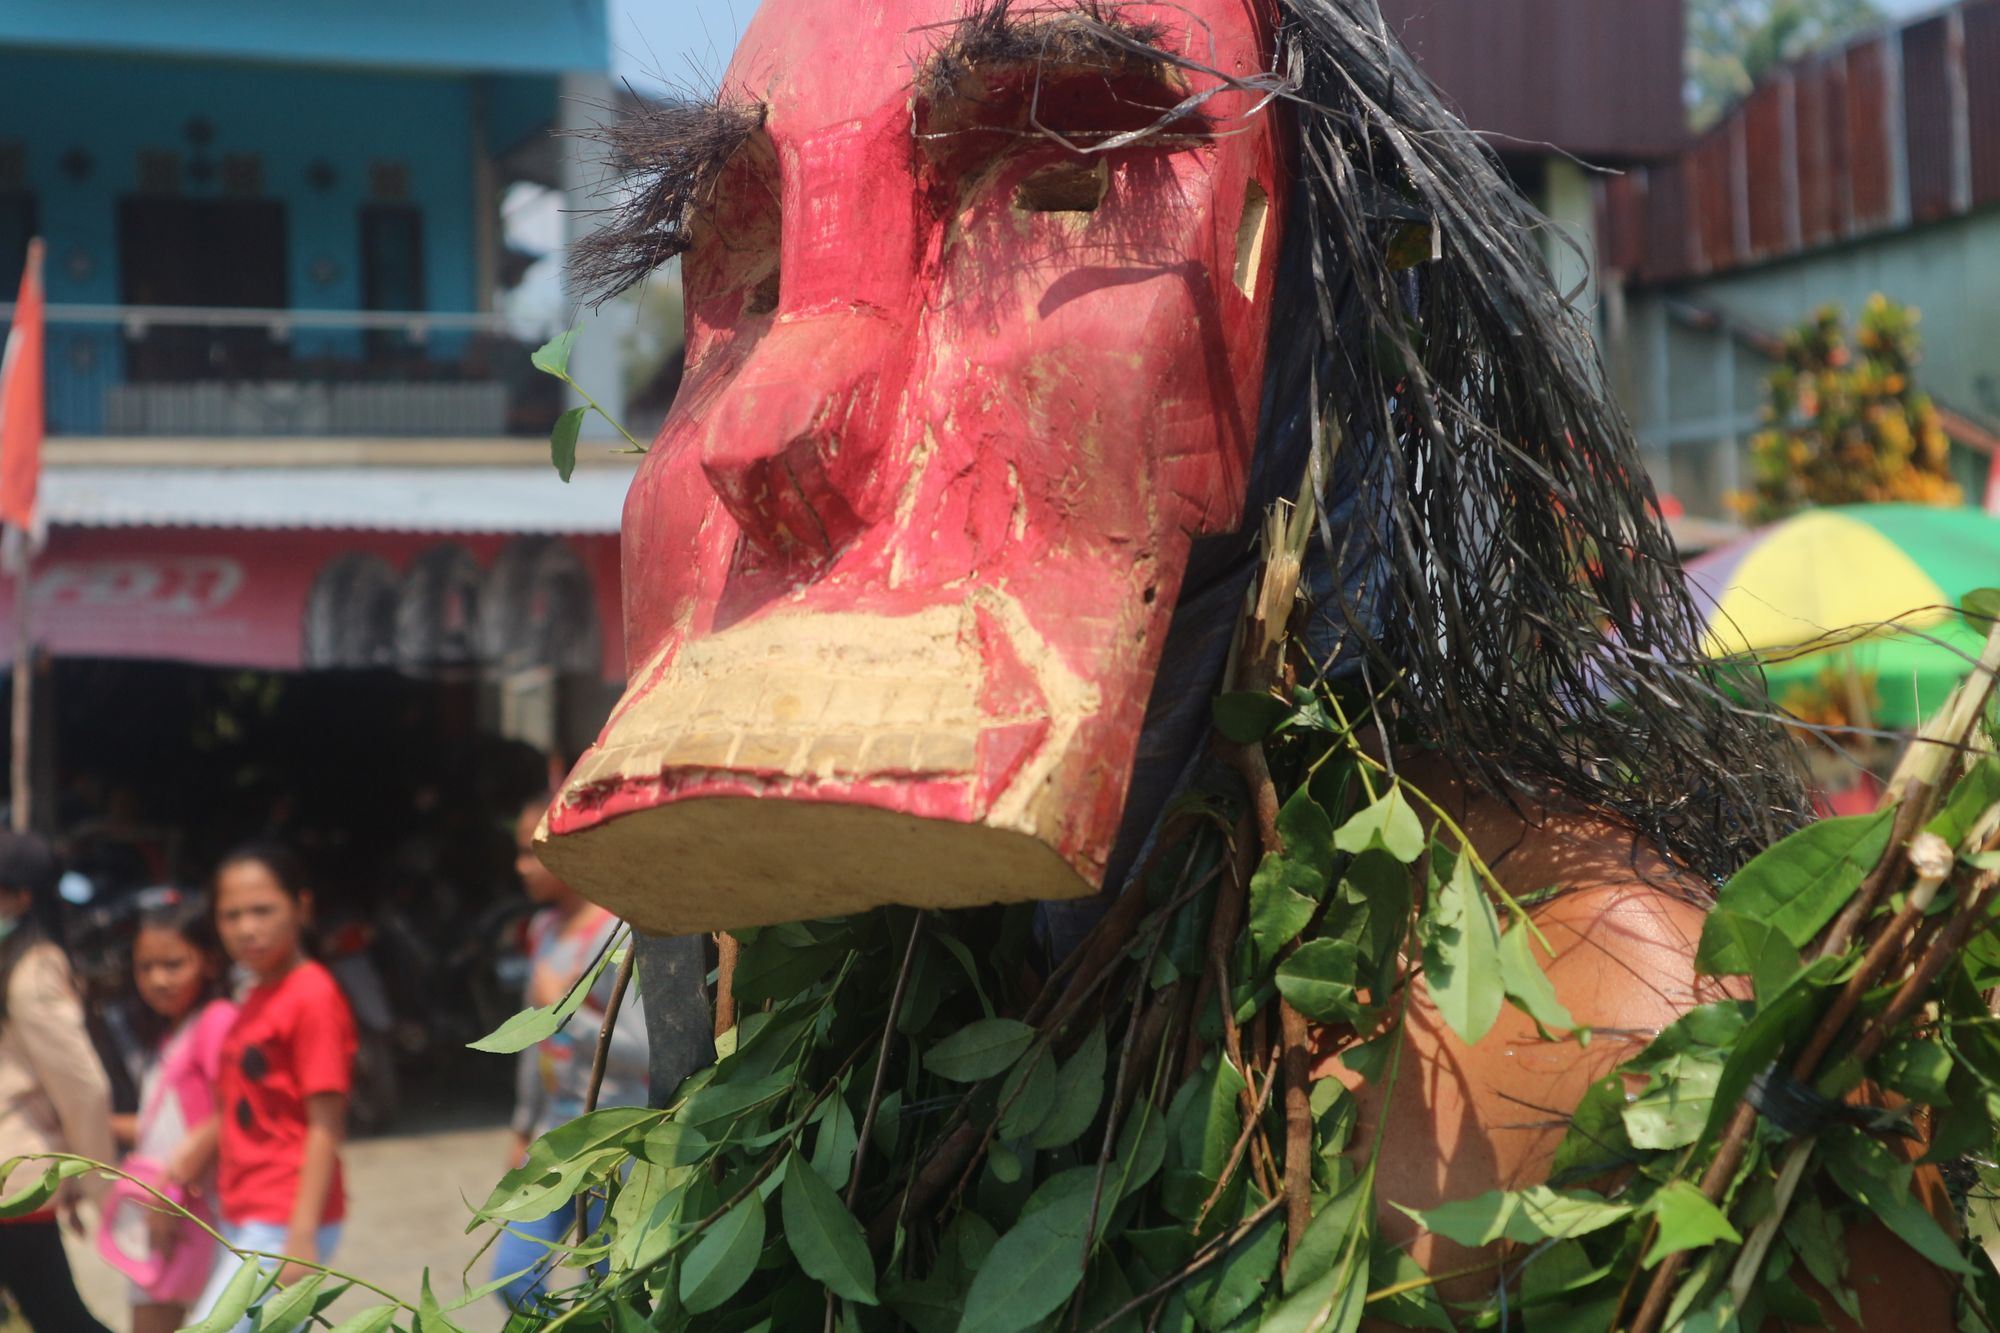 Nopeng: Mengenang Hantu dan Ritual Mangkok Merah Suku Dayak Kanayatn